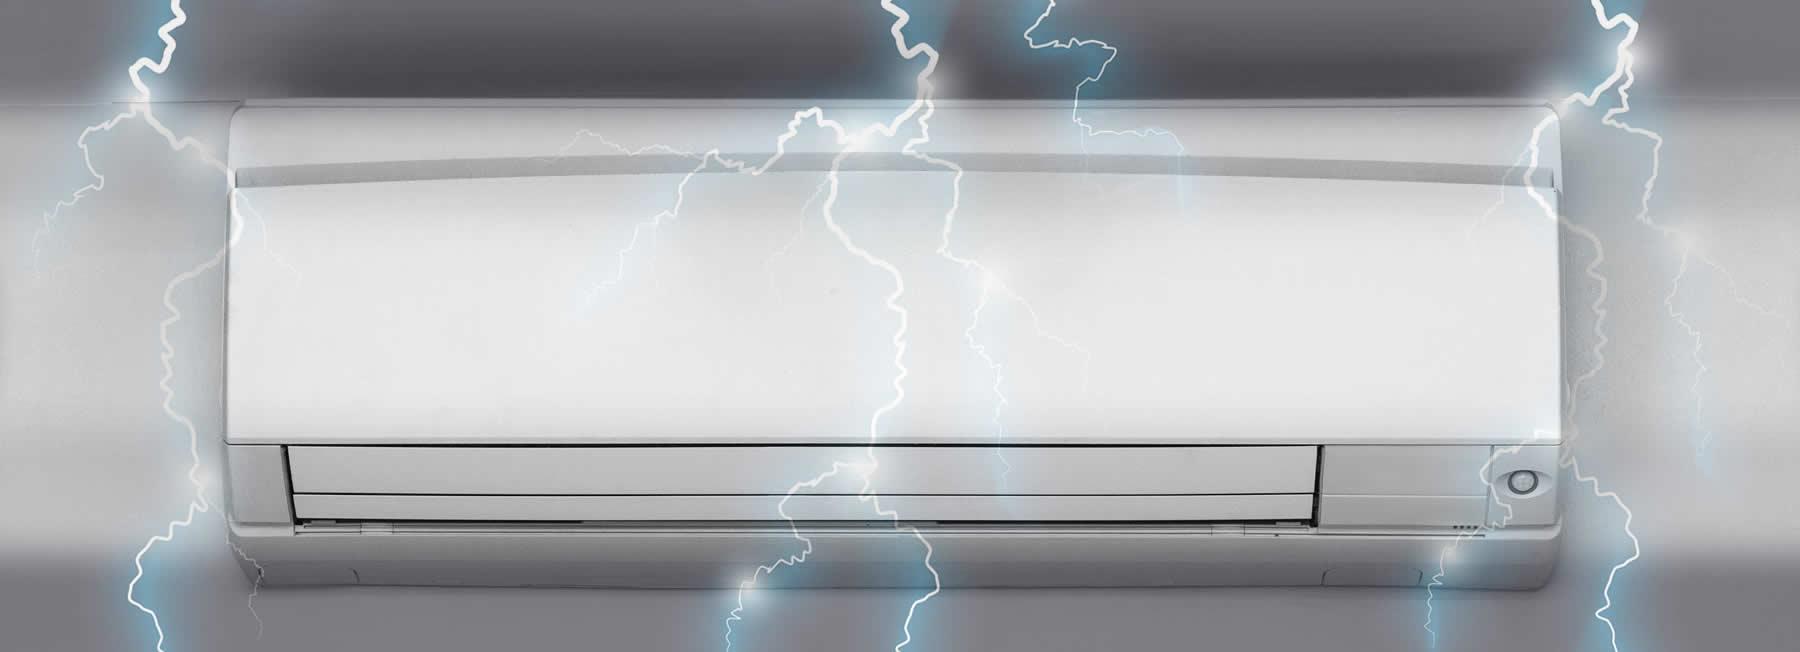 Off-peak heating electrical service.